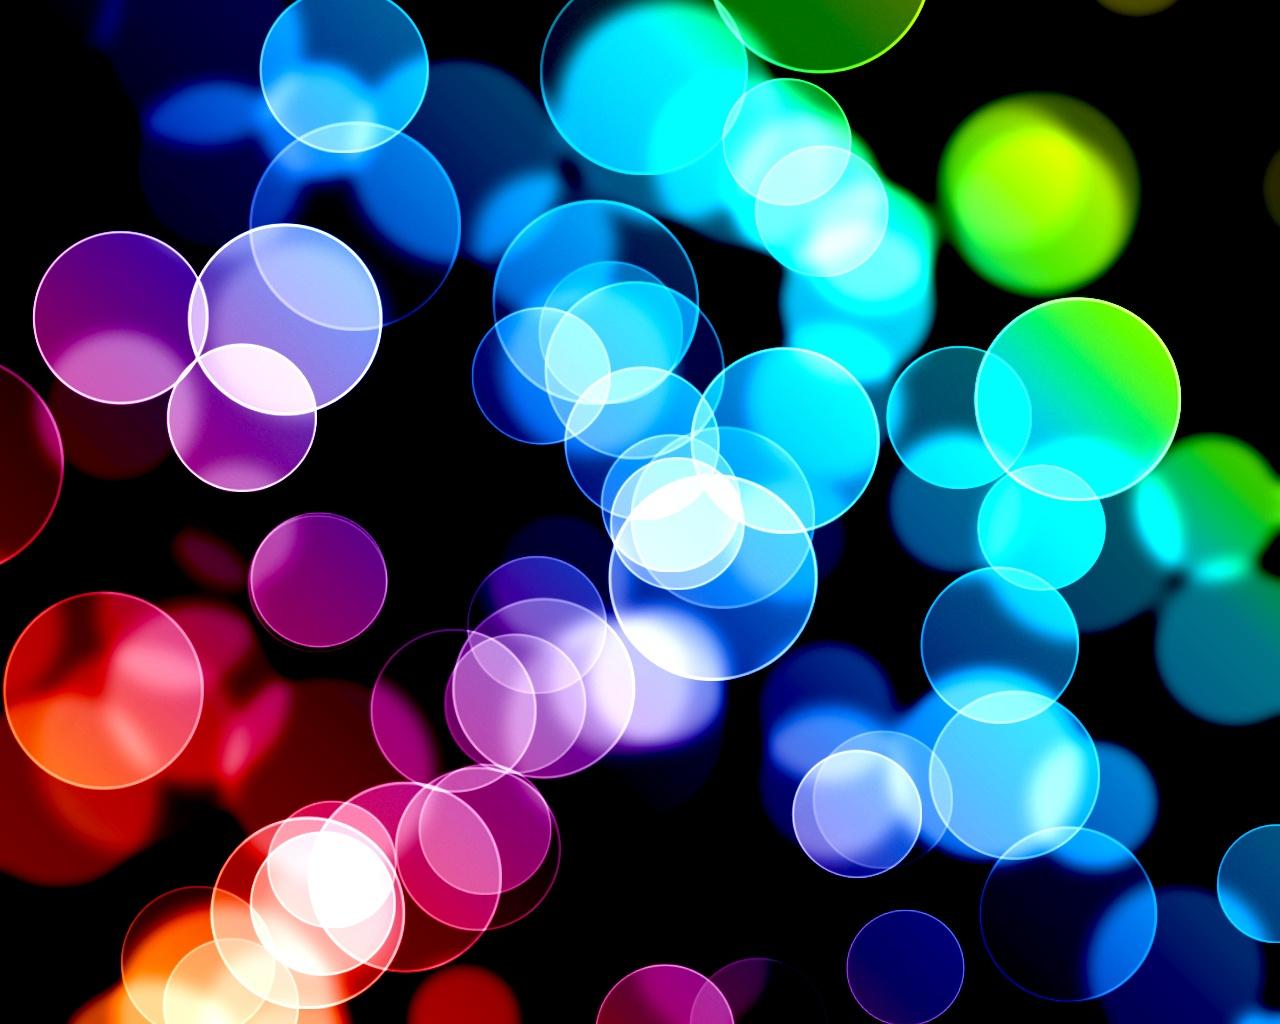 Fondos de Pantalla Gratis: Burbujas de colores